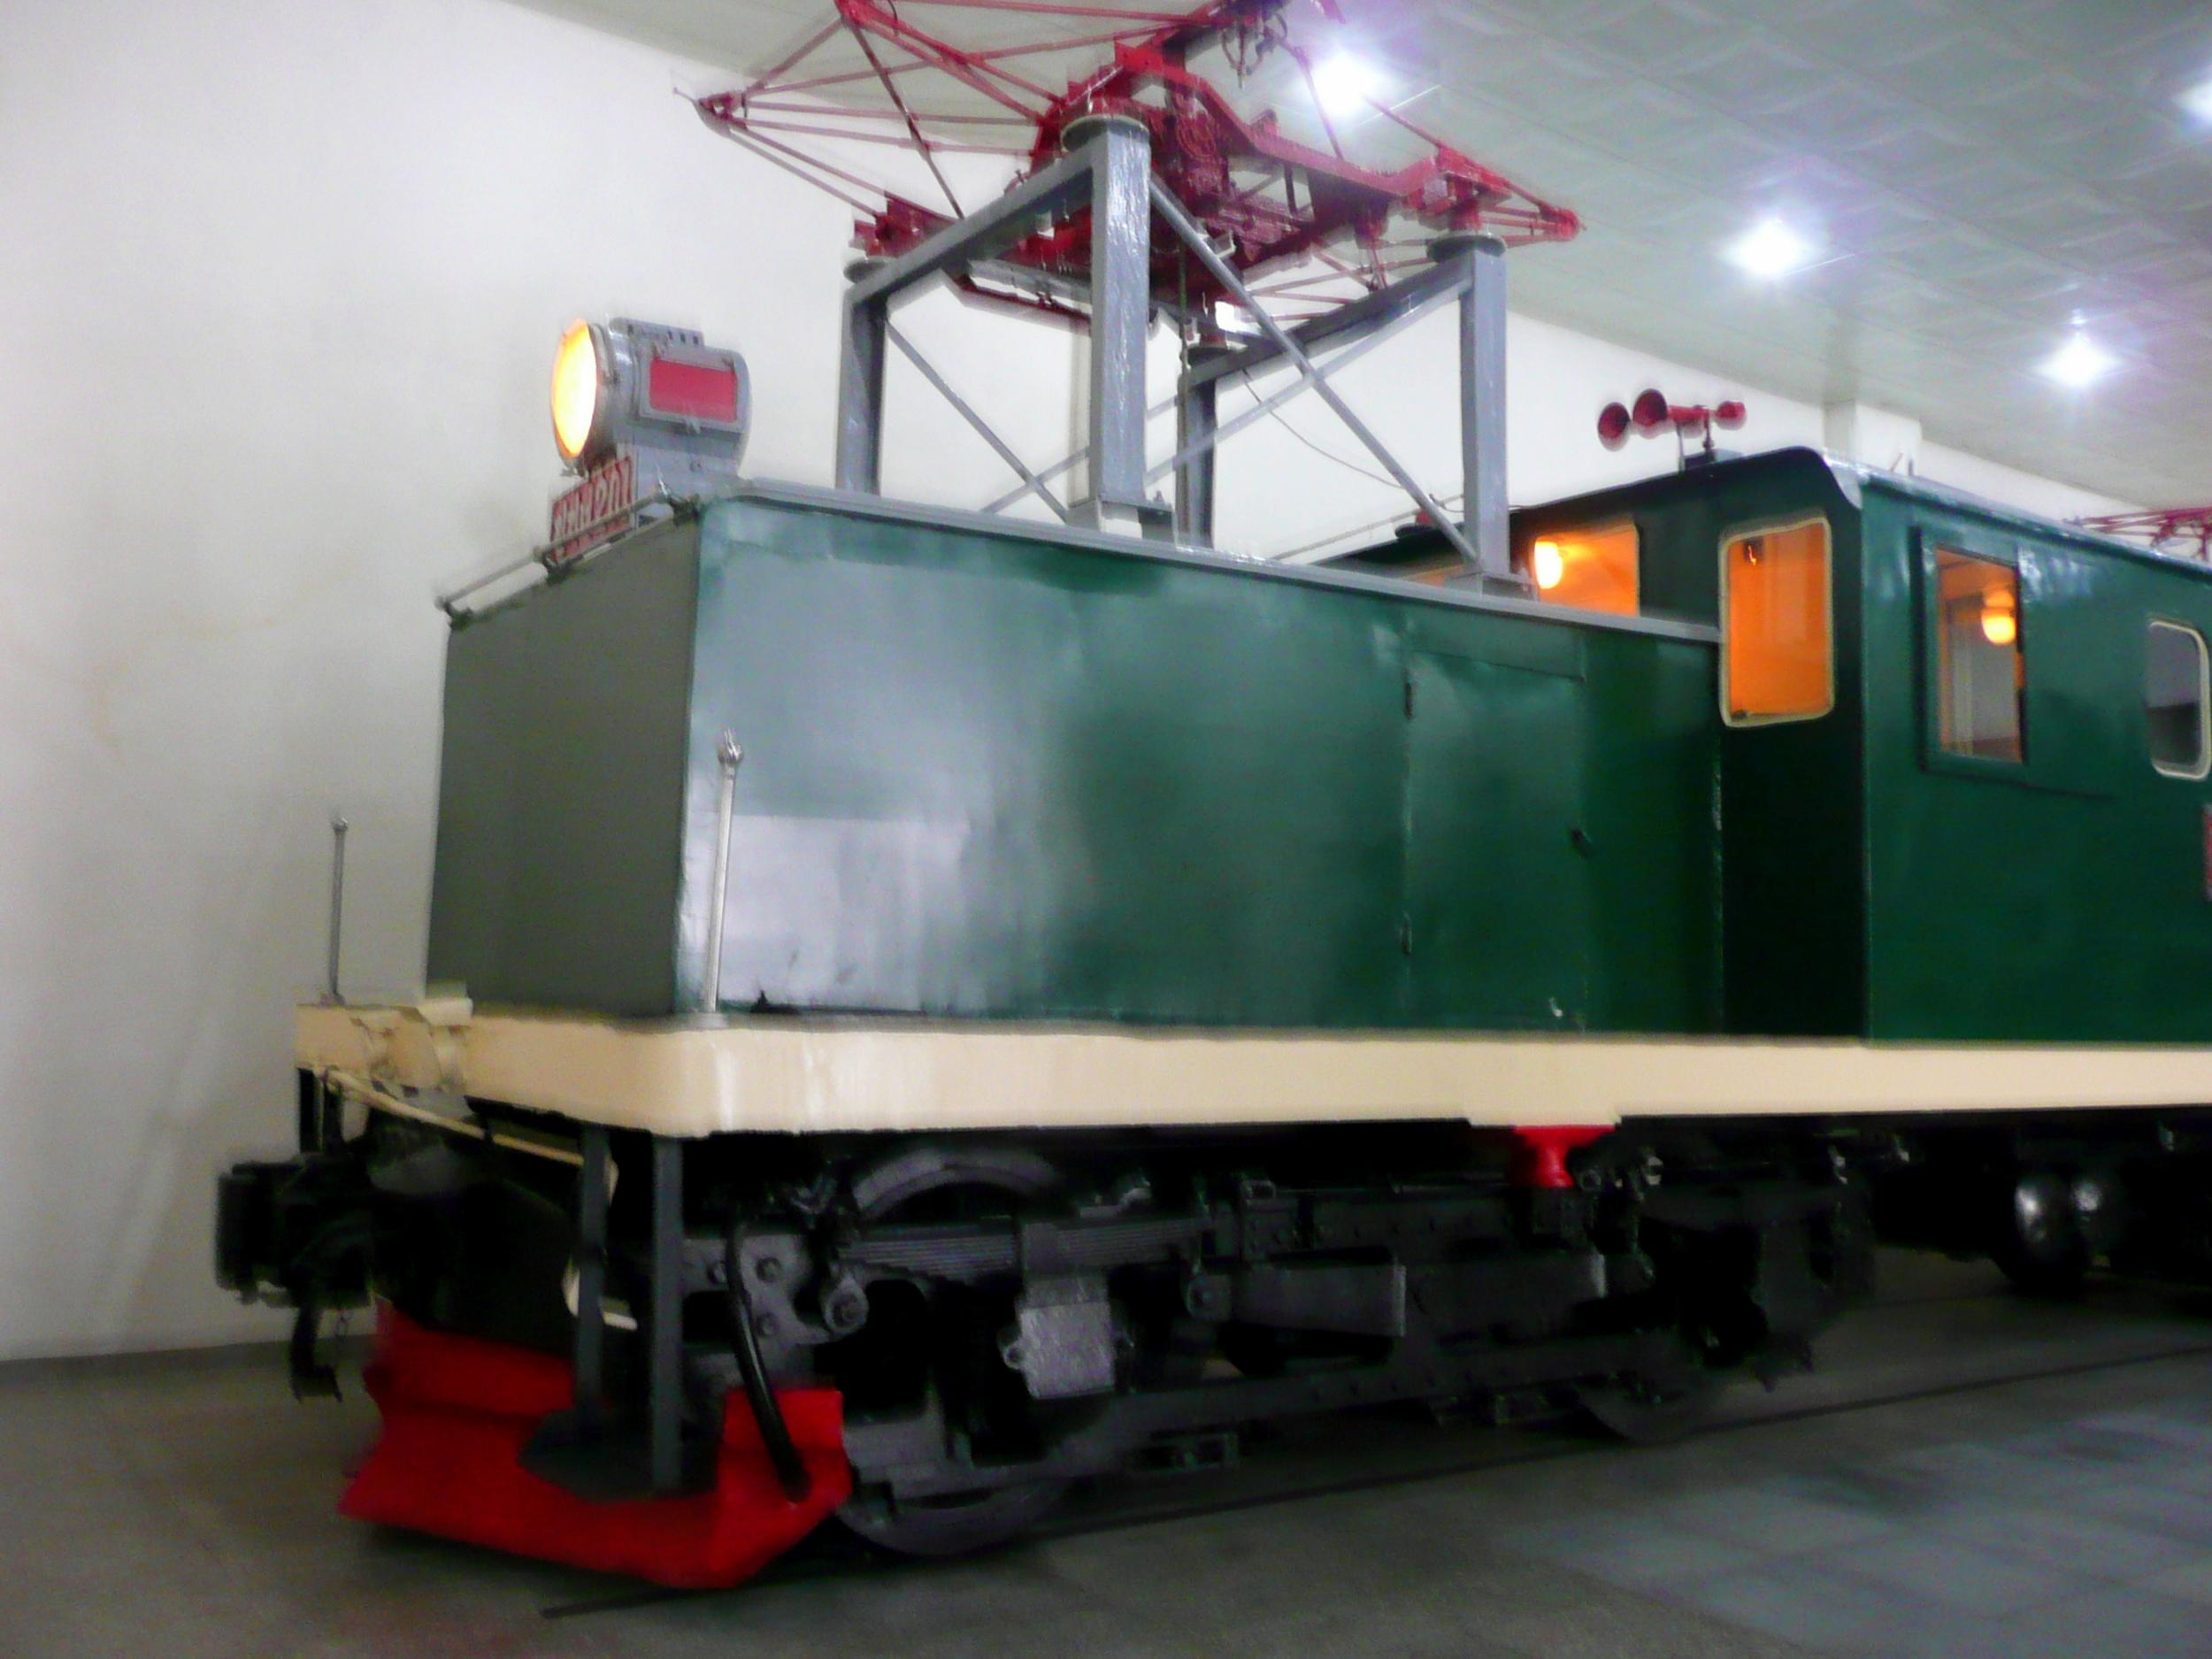 Catenary on push-pull engine